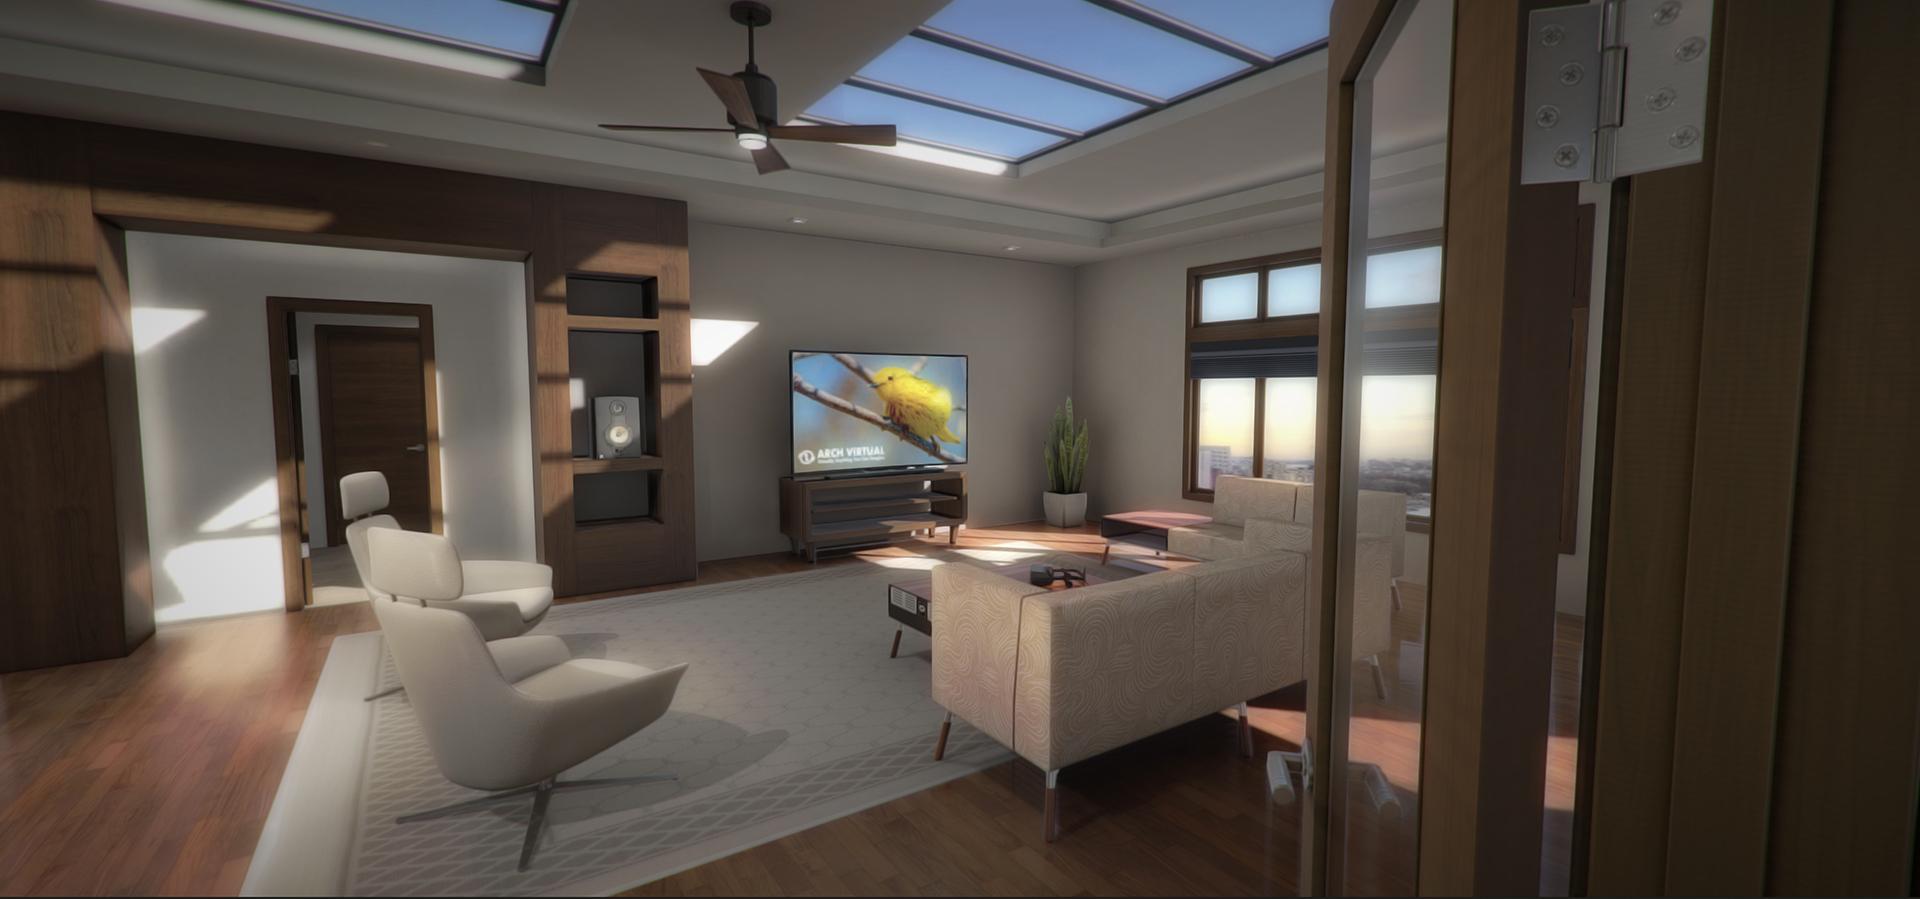 arch virtual hq. Black Bedroom Furniture Sets. Home Design Ideas